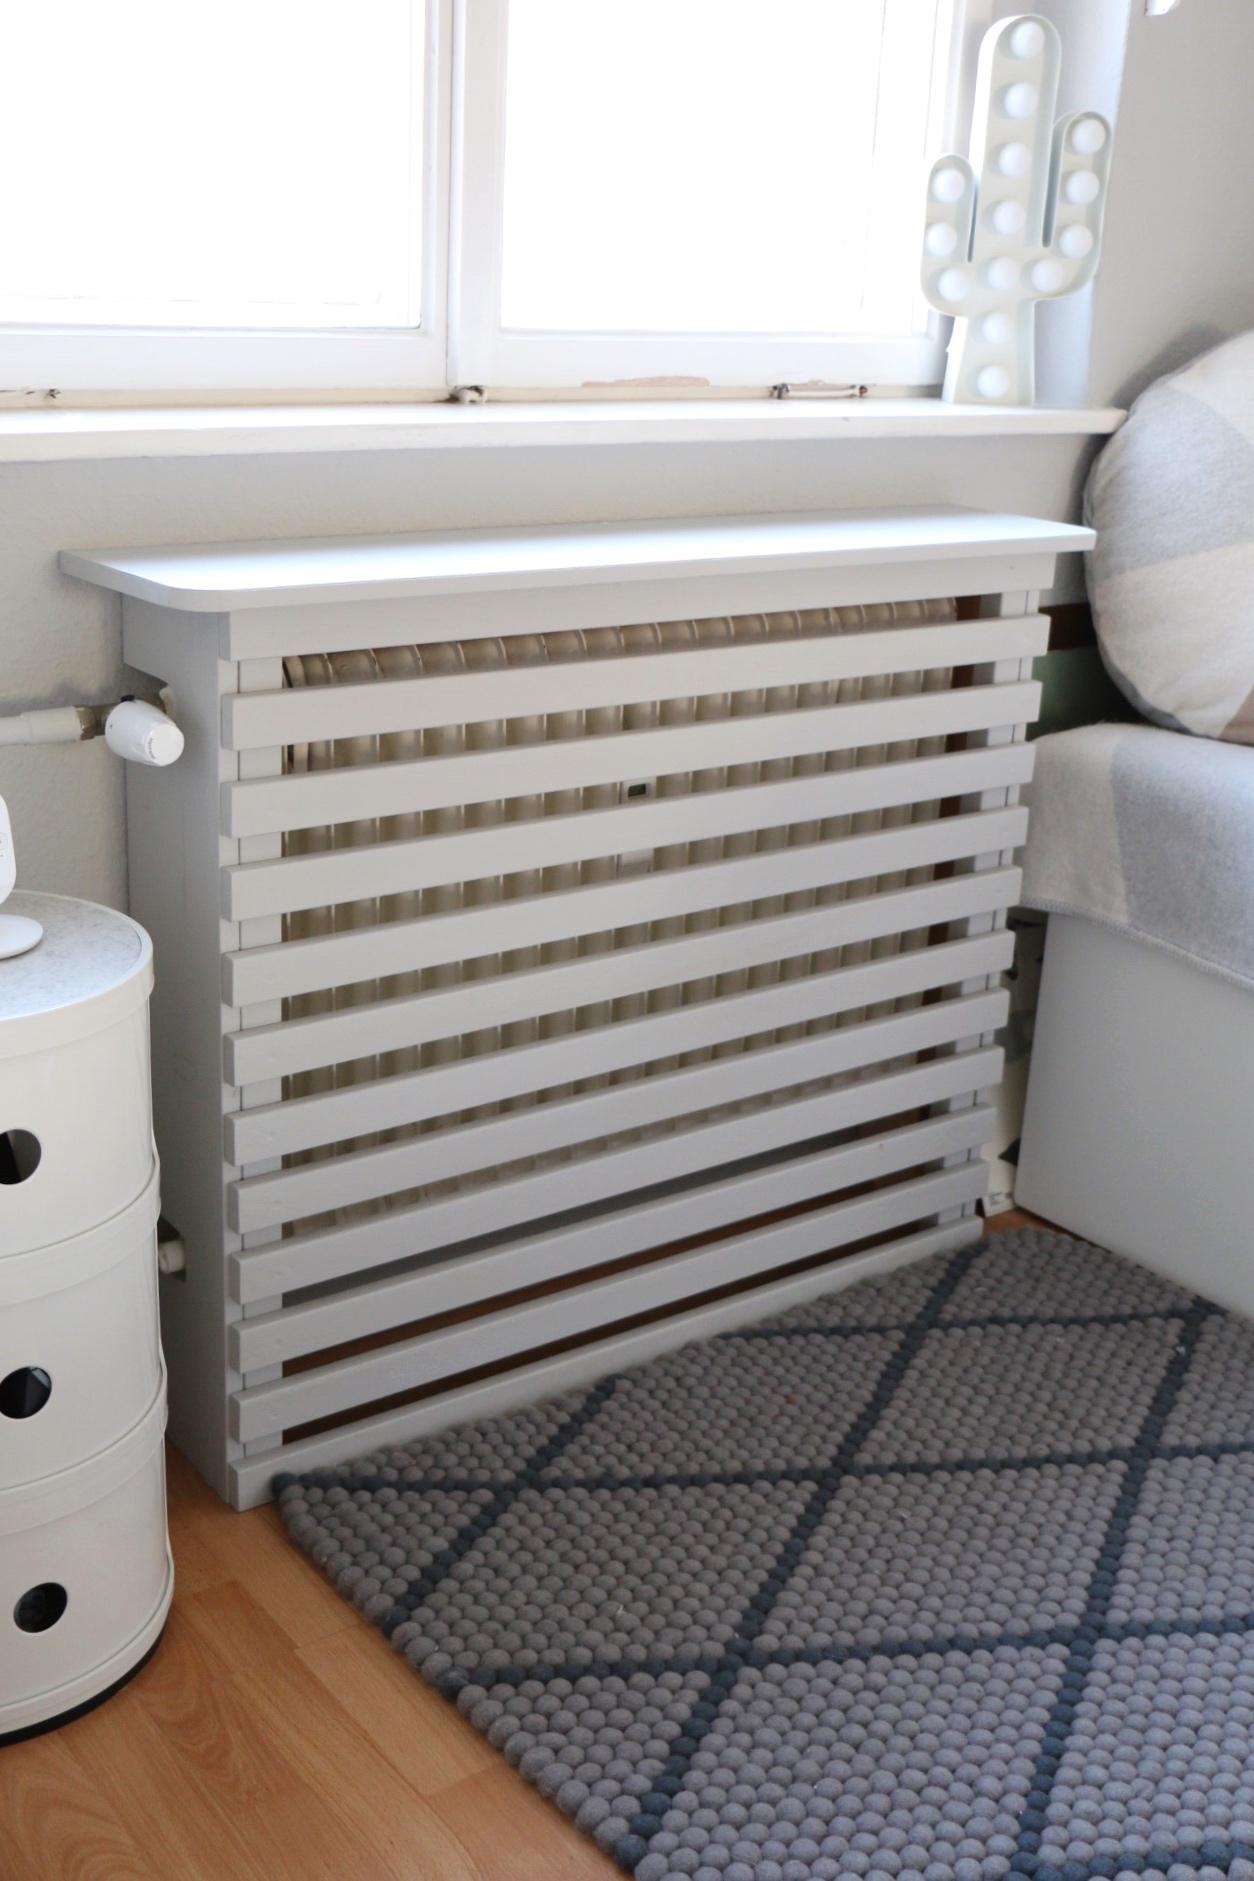 diy heizungsverkleidung aus holz selber bauen by eat blog love. Black Bedroom Furniture Sets. Home Design Ideas